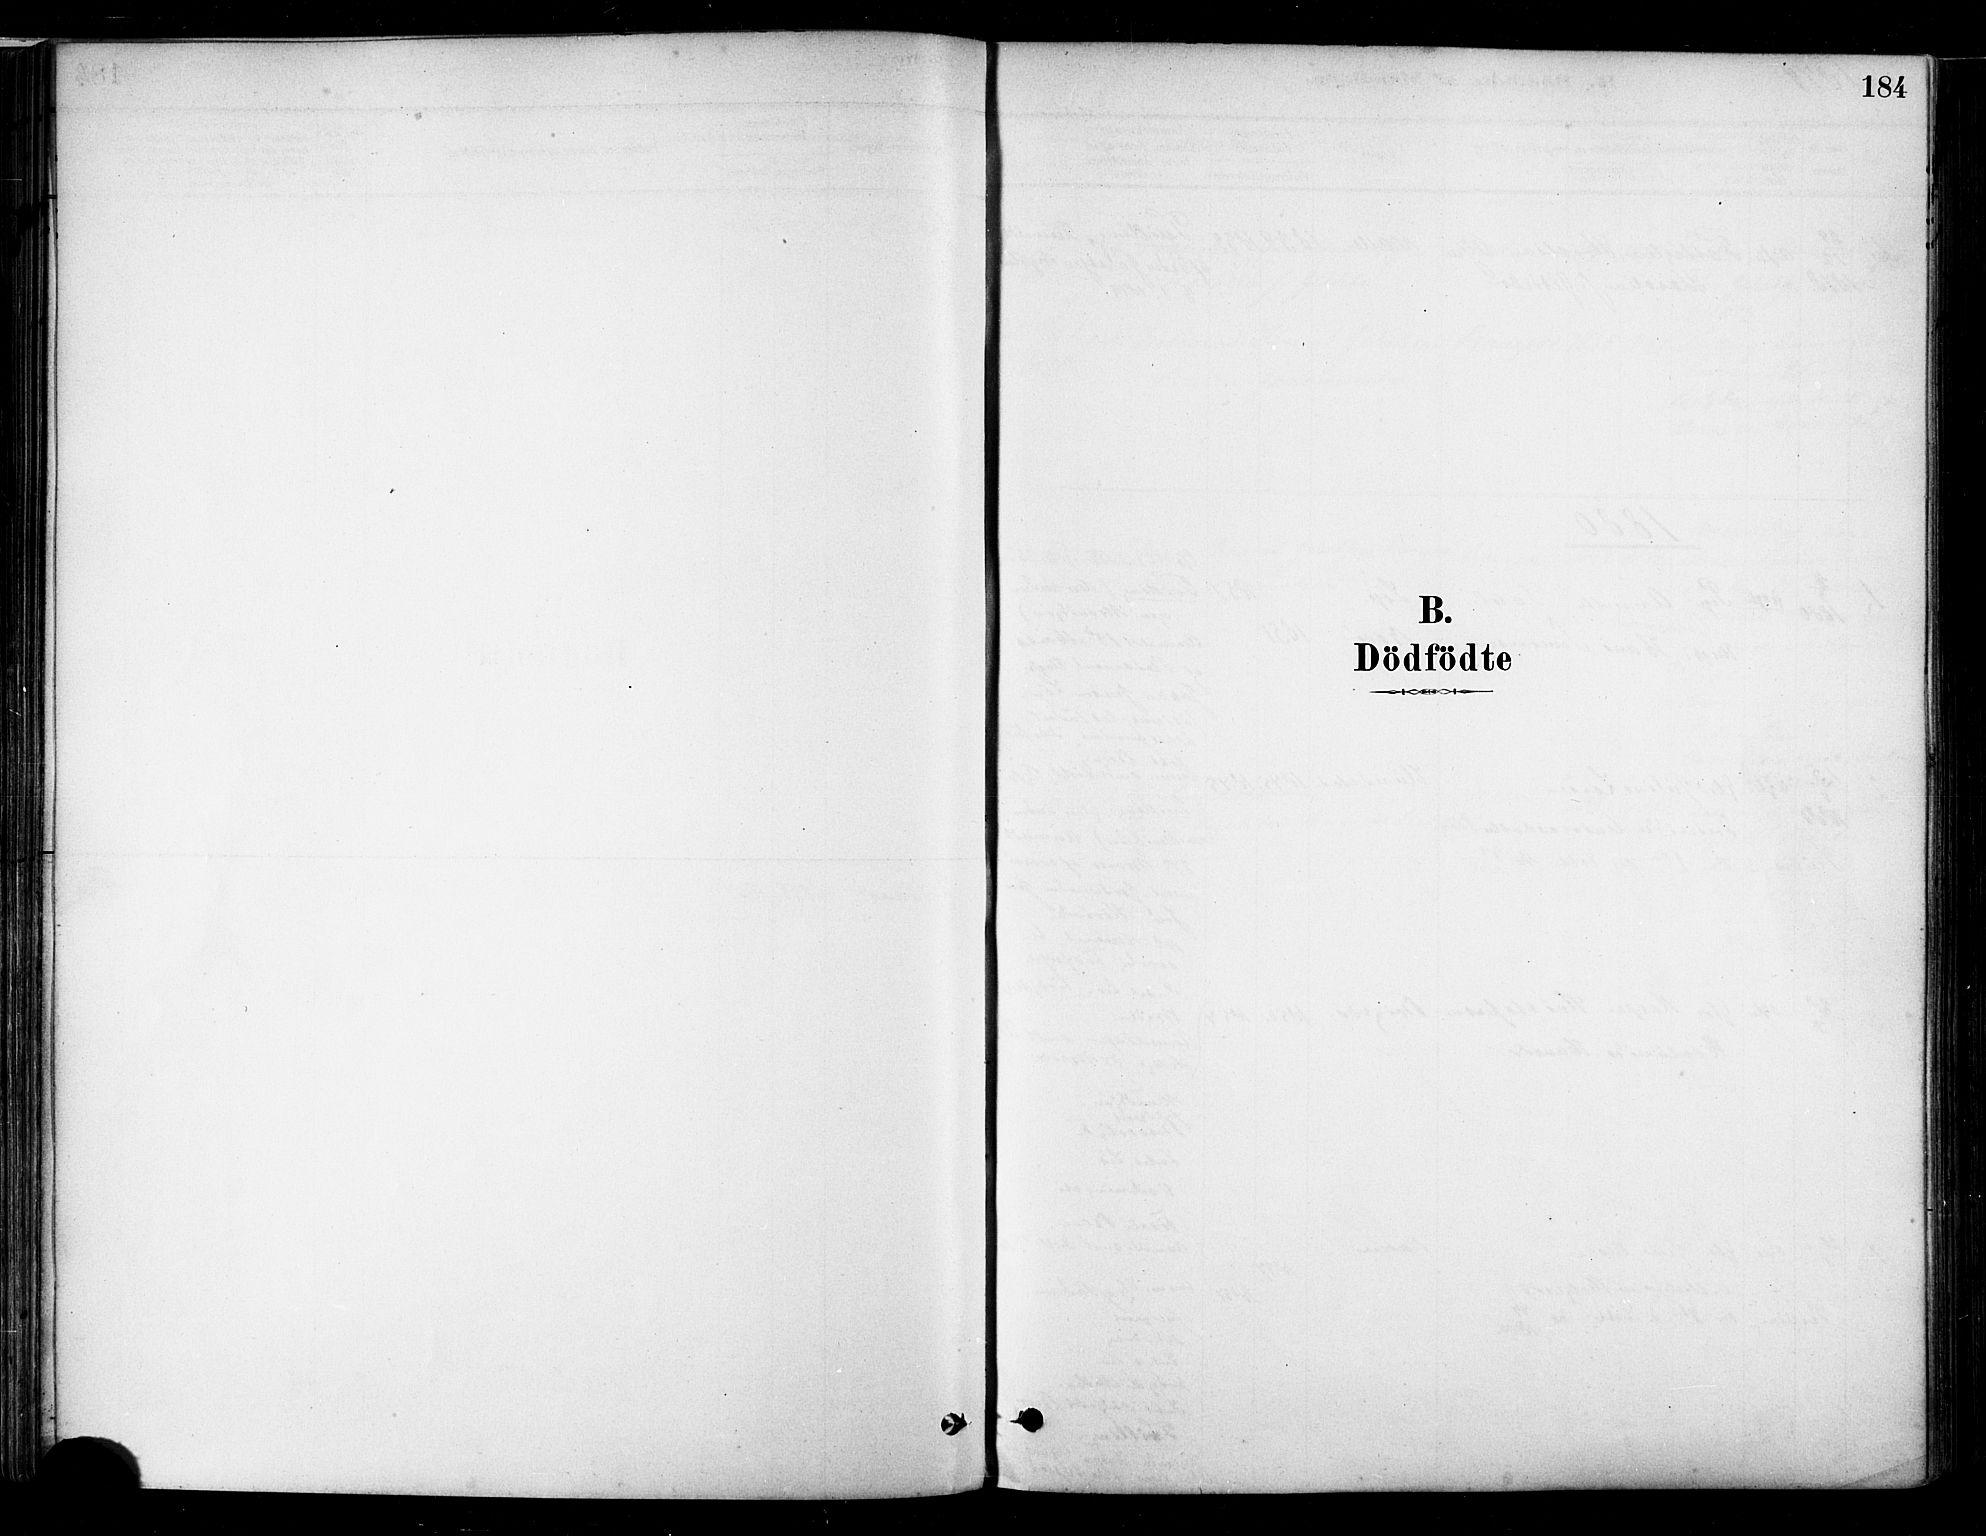 SAT, Ministerialprotokoller, klokkerbøker og fødselsregistre - Nordland, 802/L0054: Ministerialbok nr. 802A01, 1879-1893, s. 184